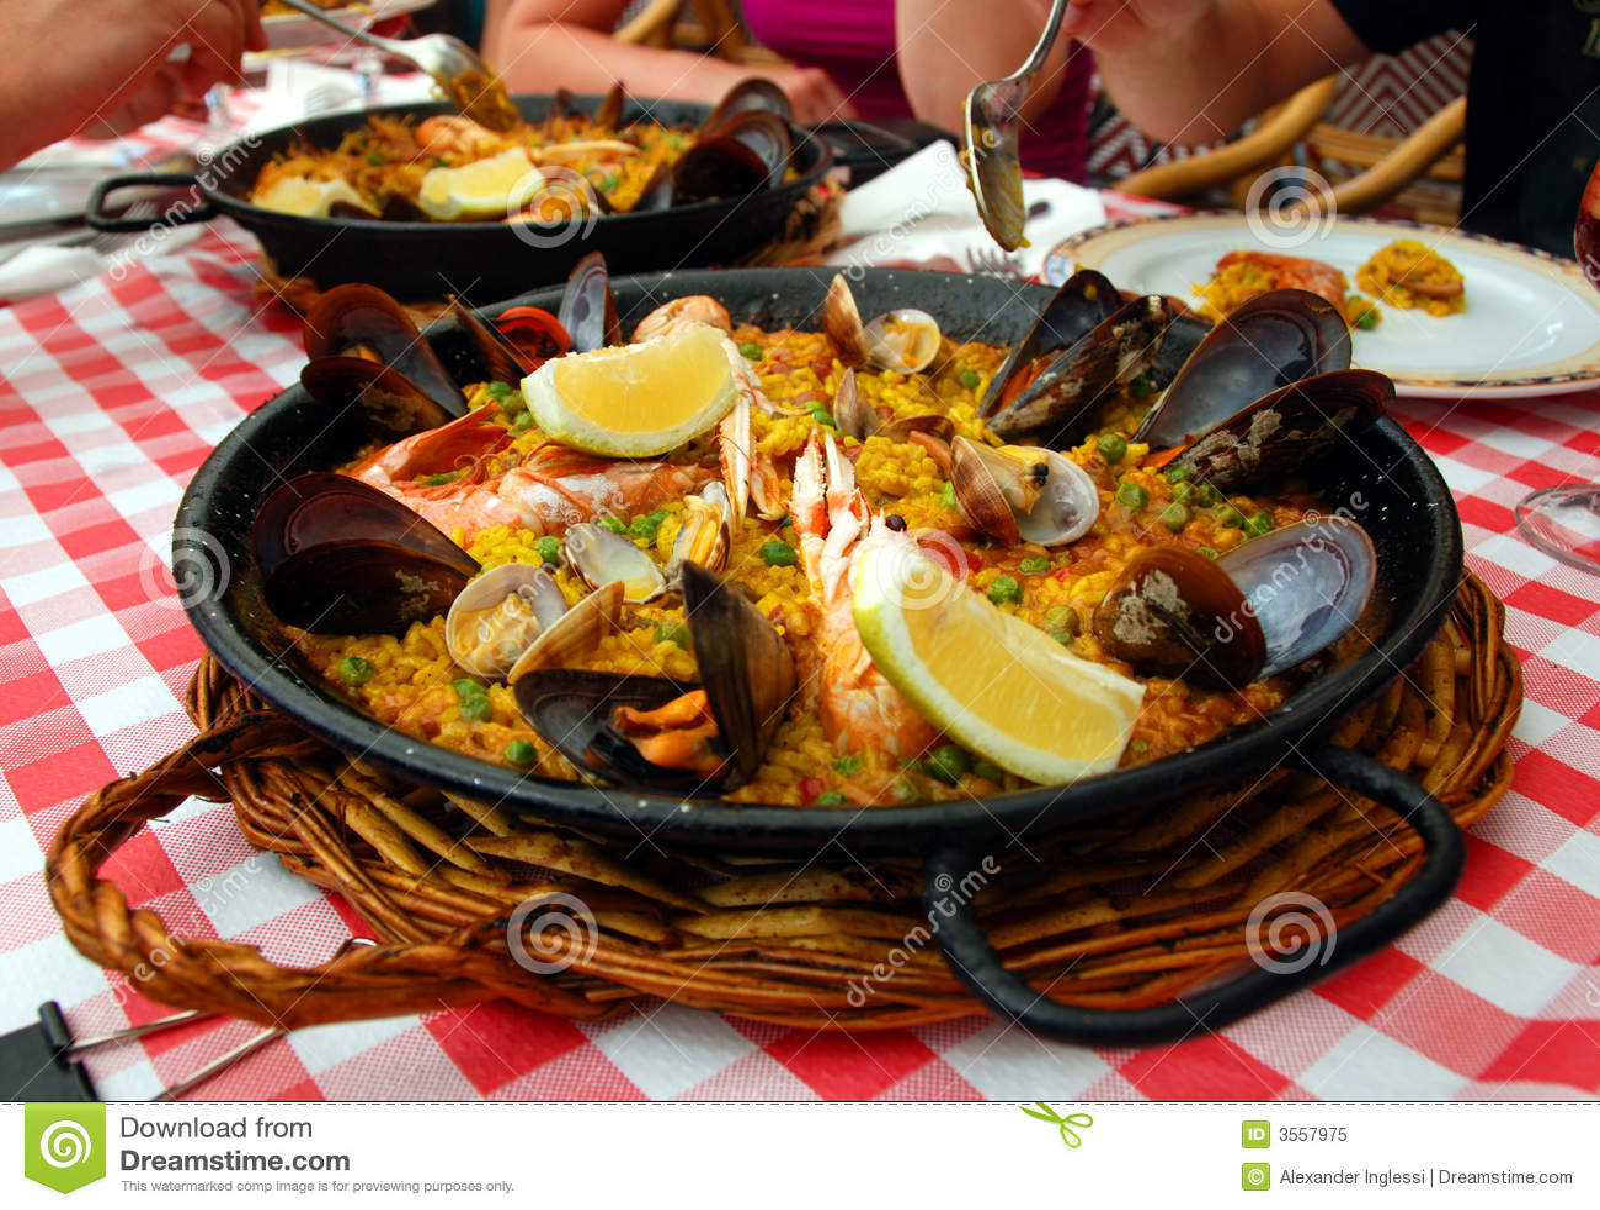 paella espagnole dans le carter image stock image du viande shellfish 3557975. Black Bedroom Furniture Sets. Home Design Ideas